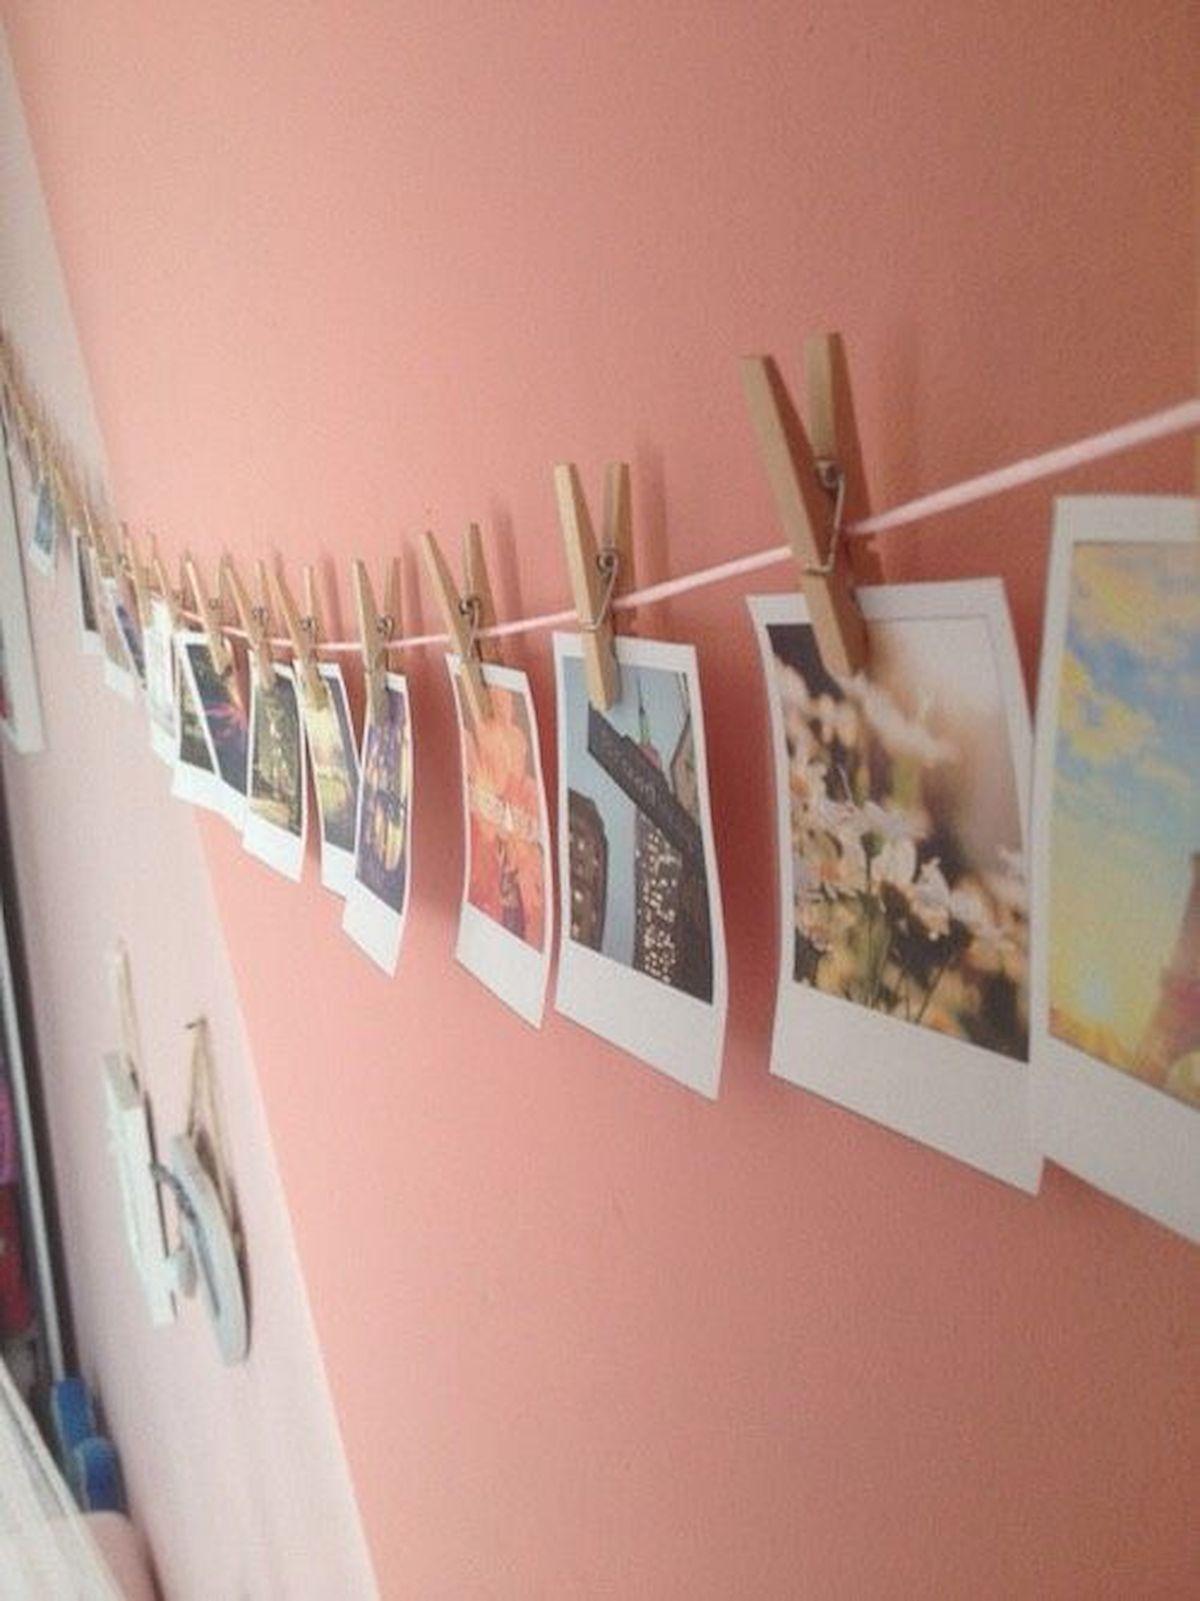 45 Beautiful Bedroom Decor Ideas for Teens (15)